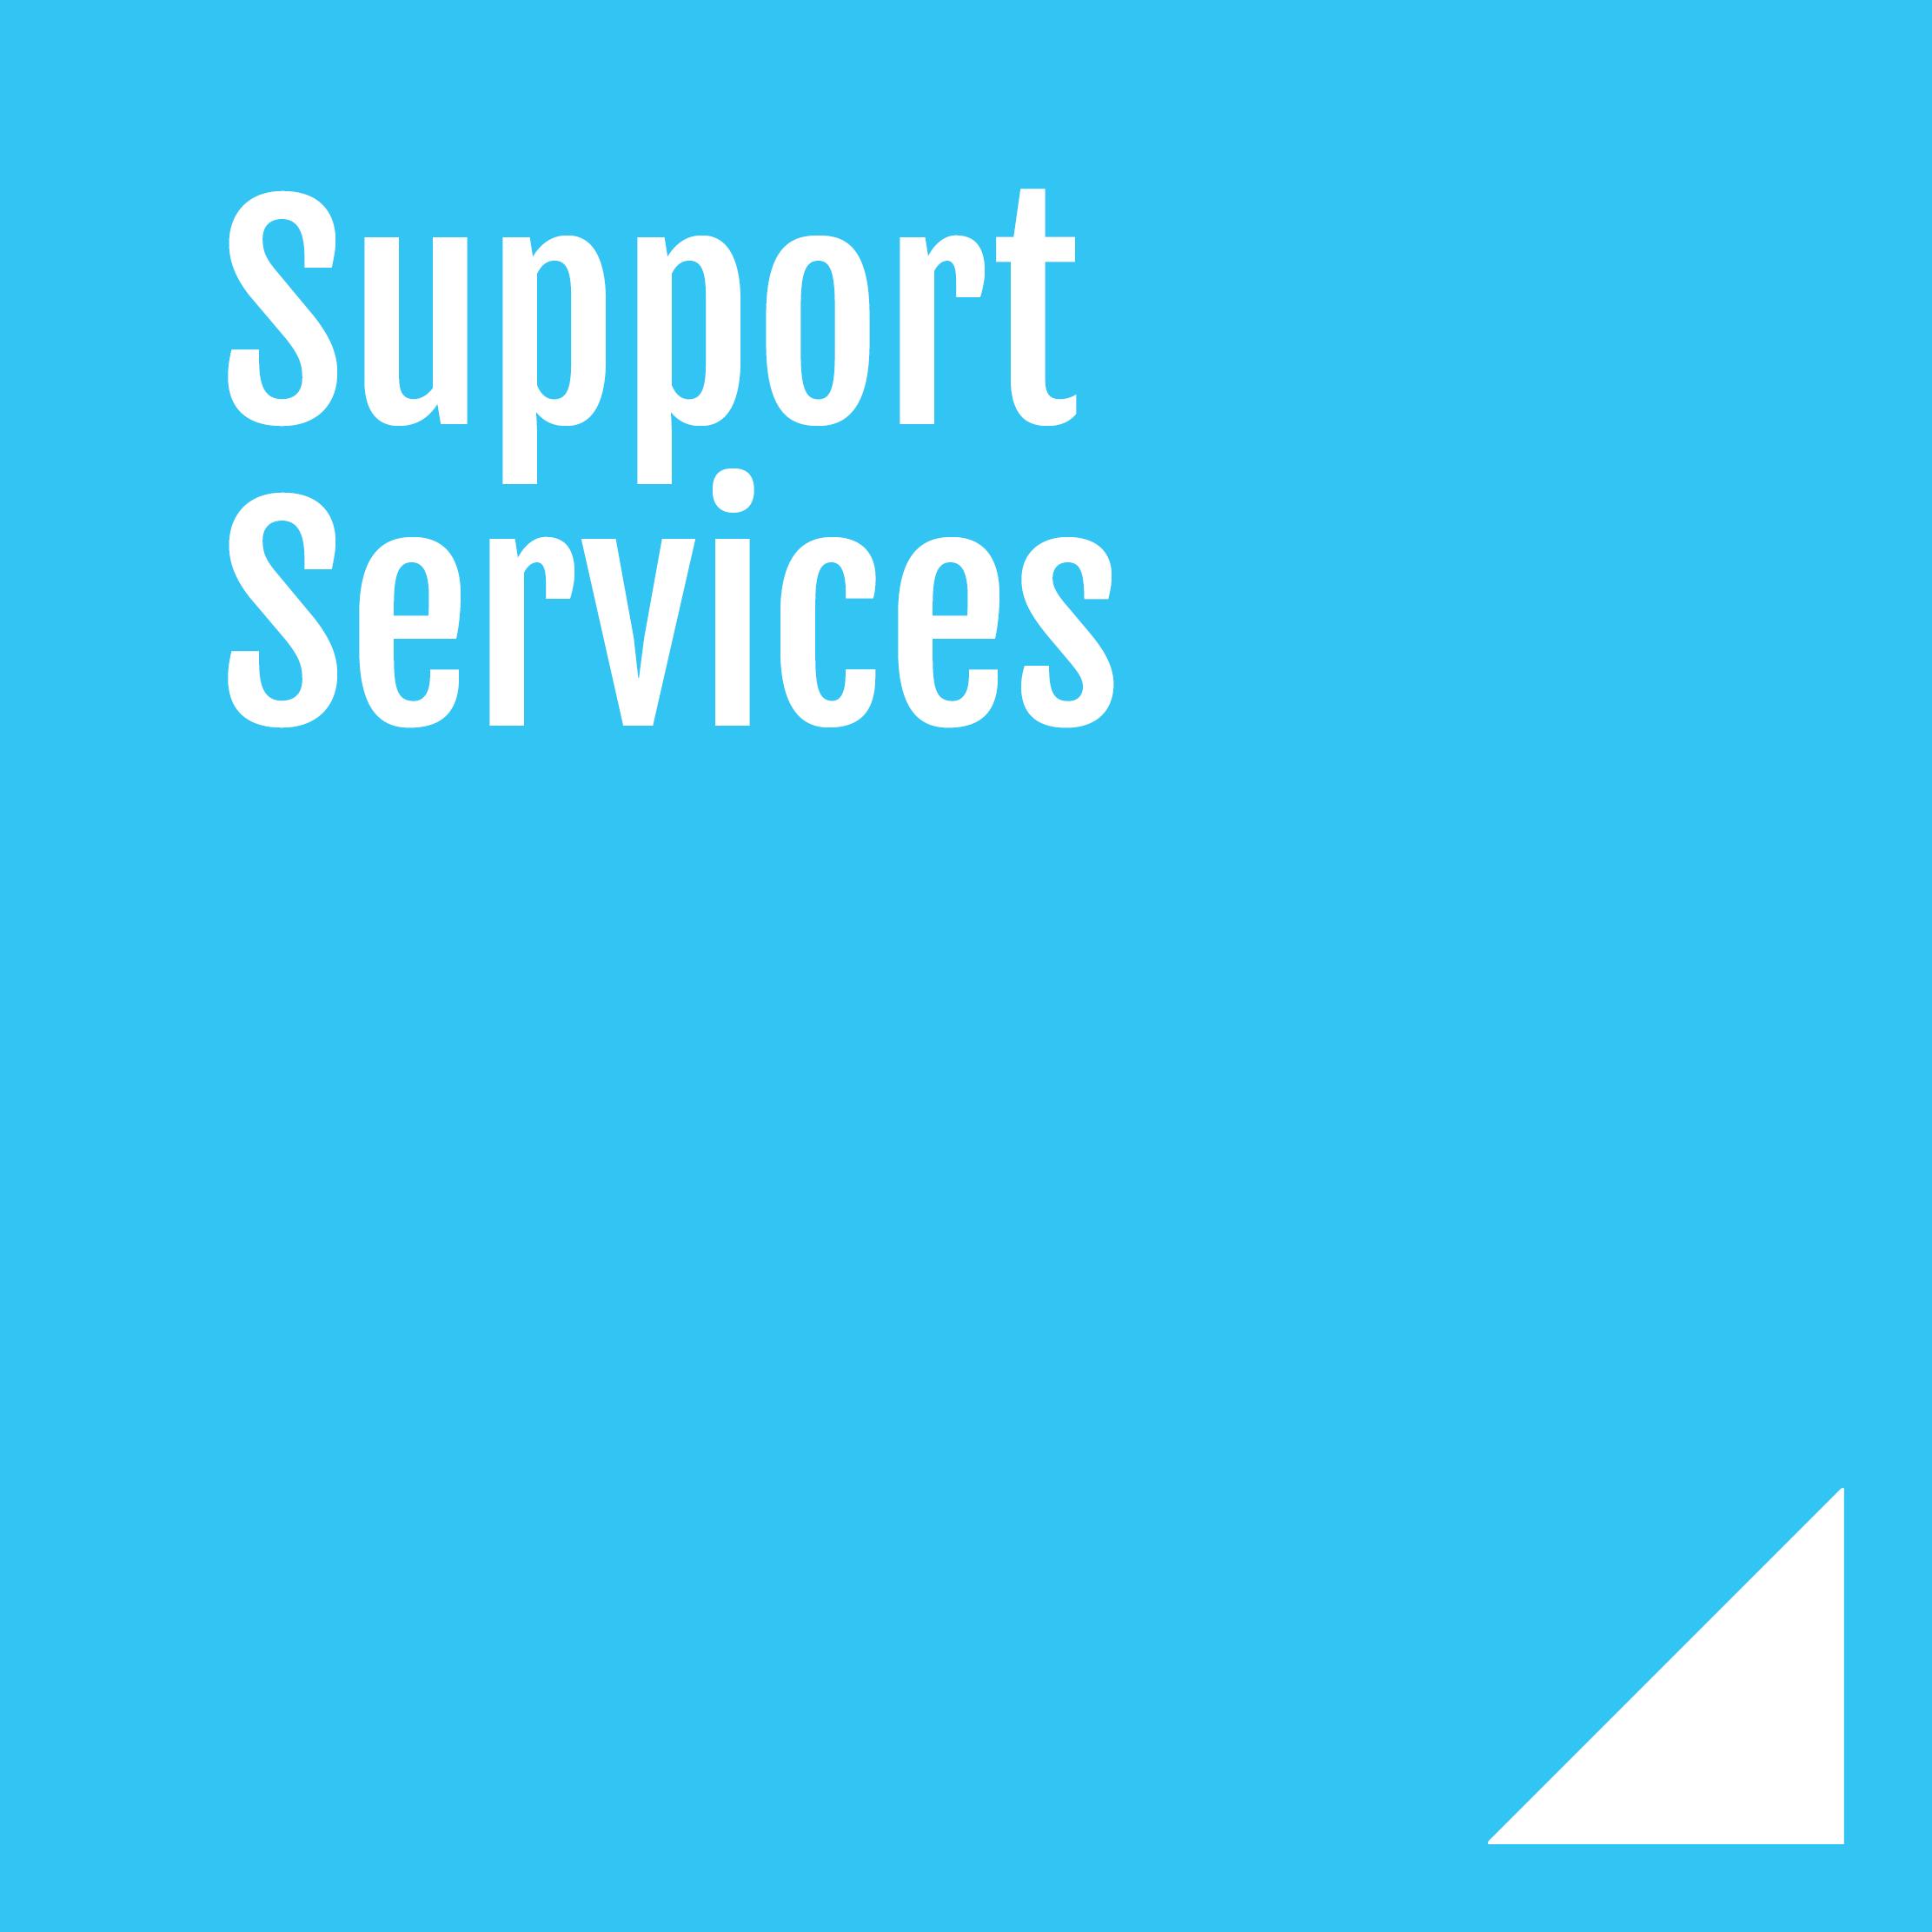 advisory-services-b2b-marketing-agency-toronto.png